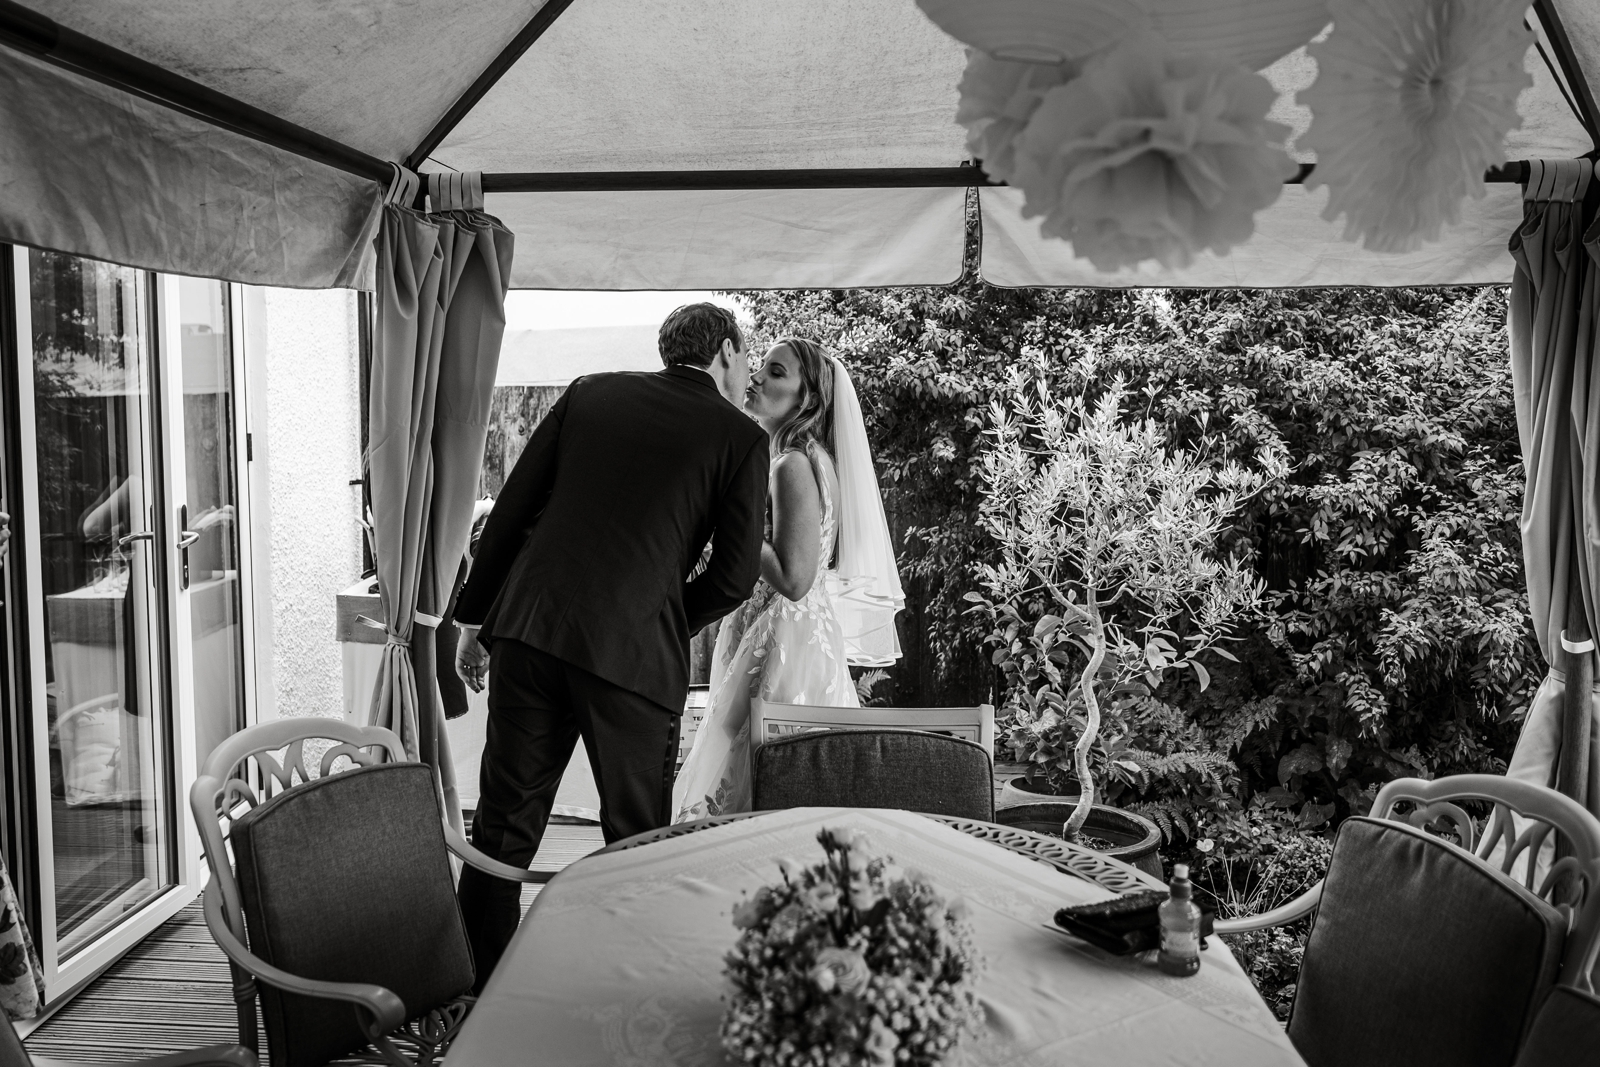 Bride and groom enter home wedding reception